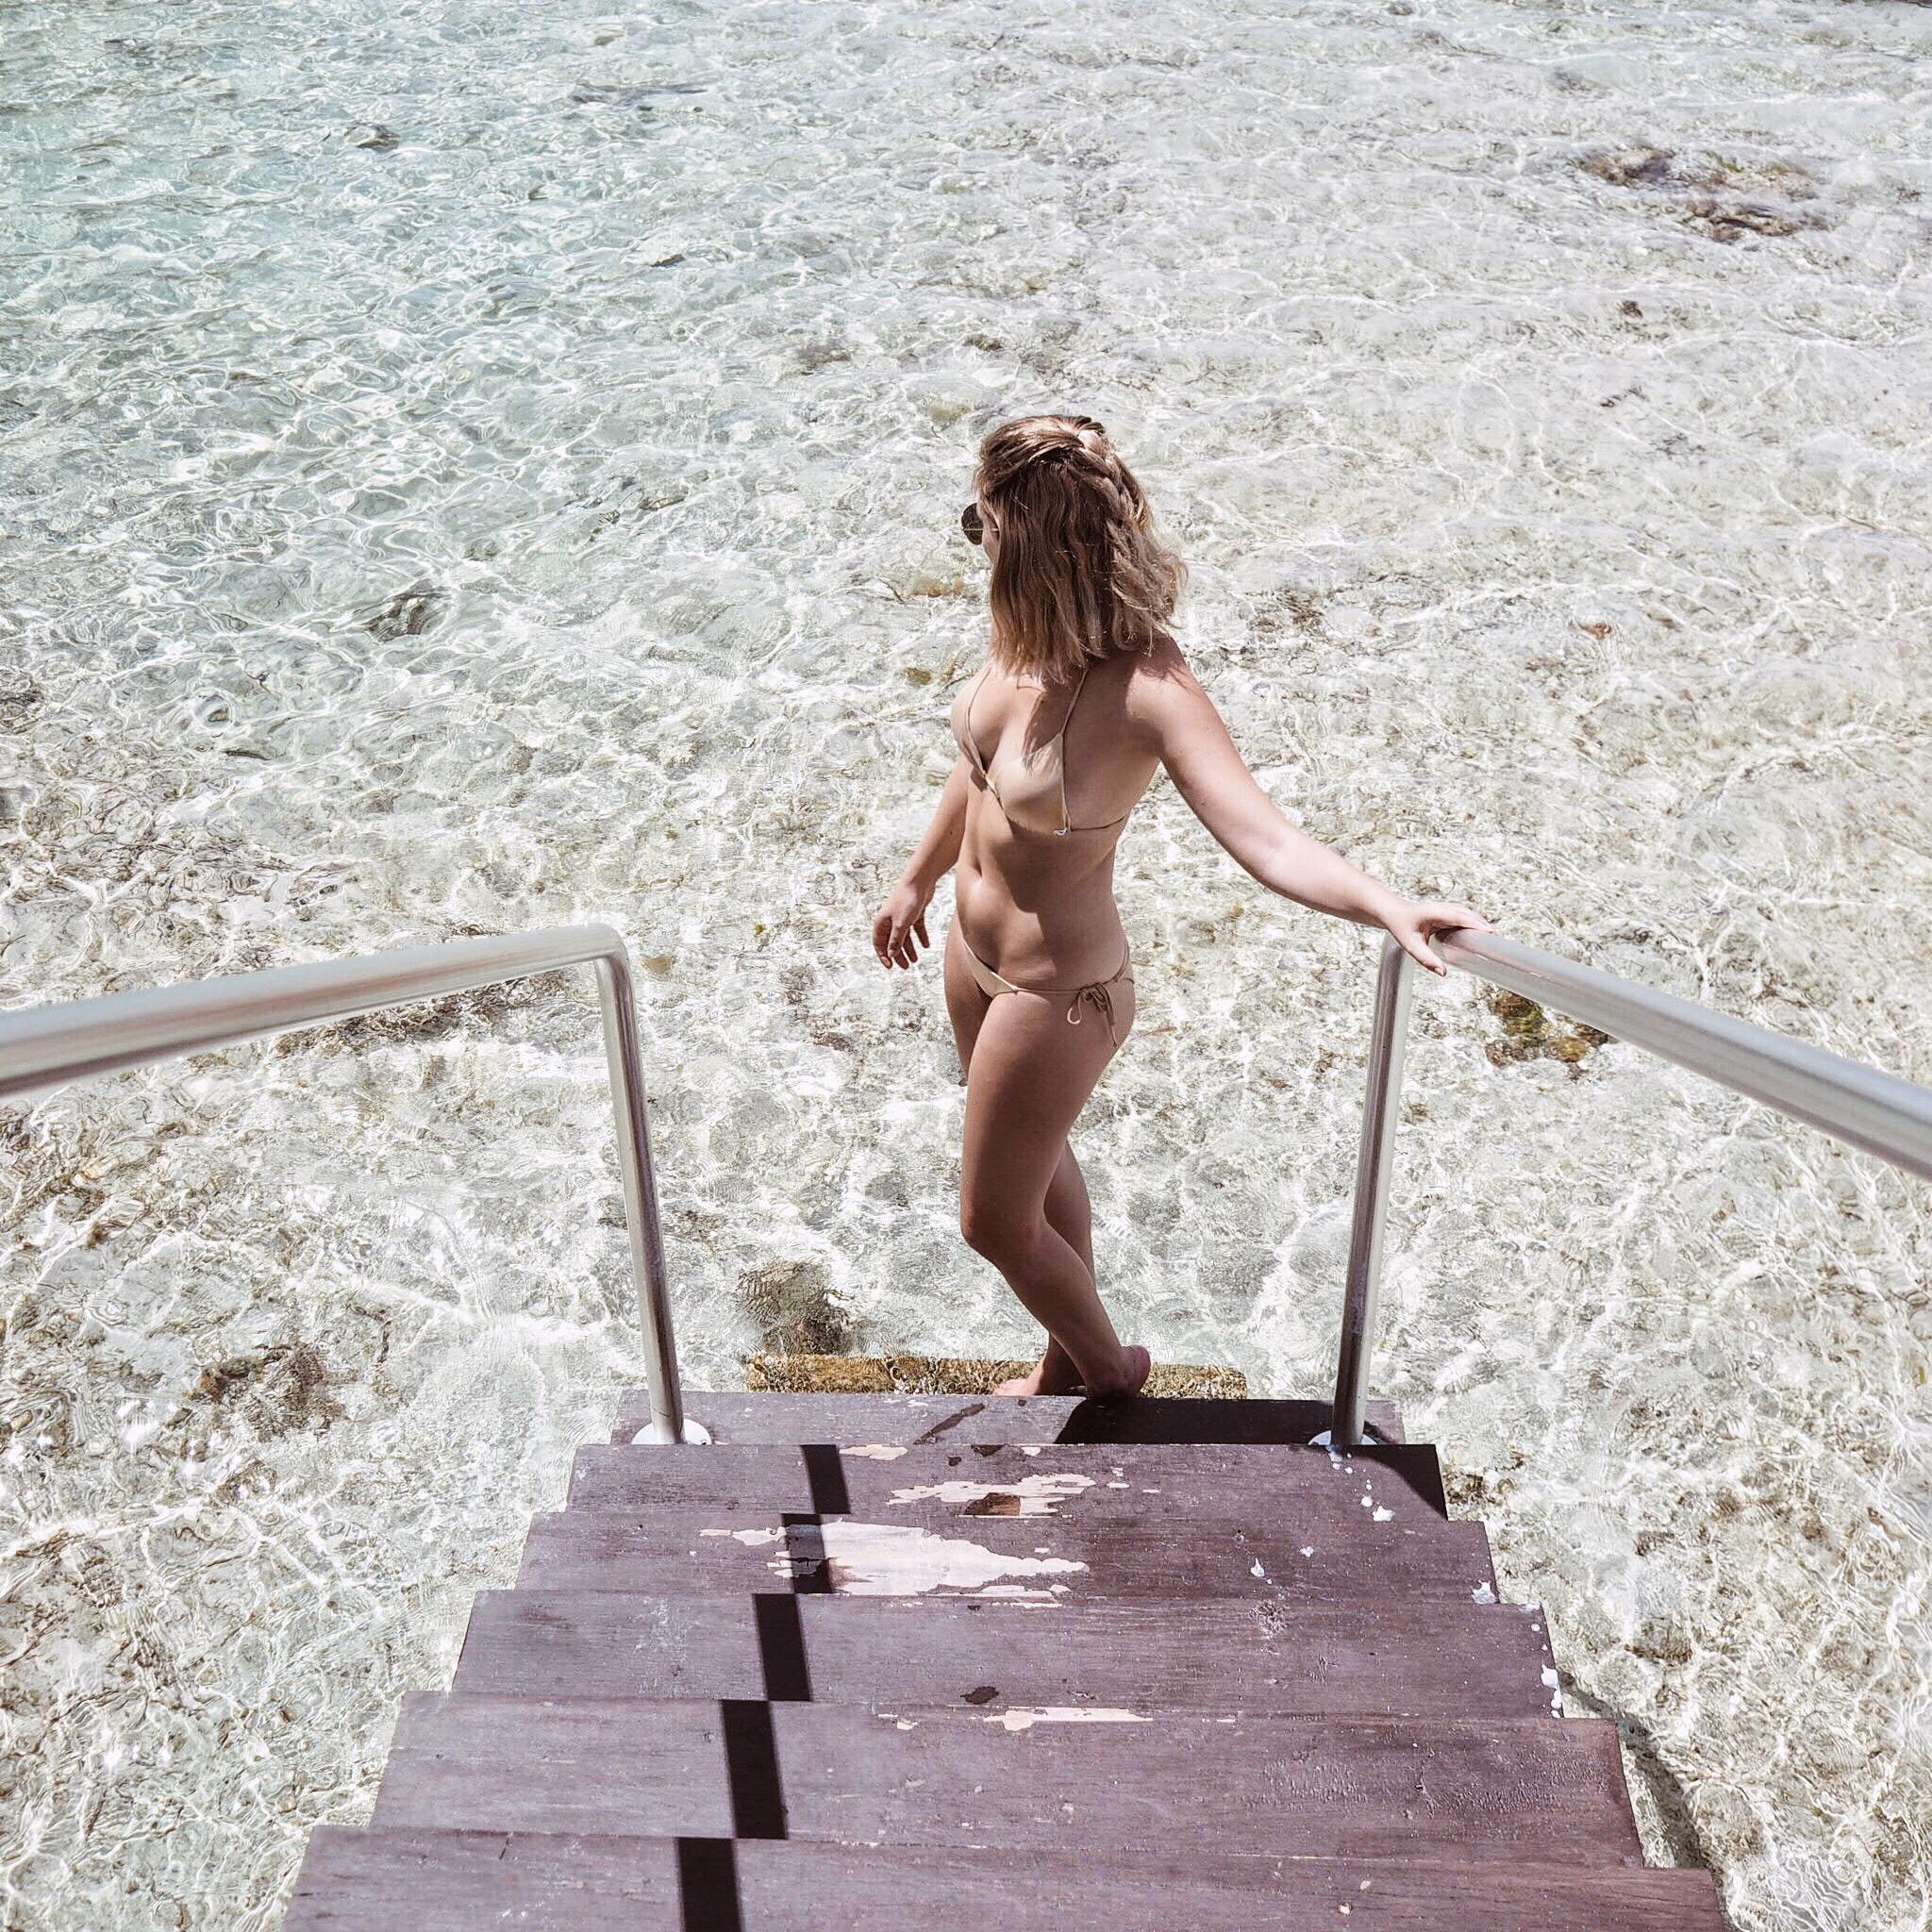 sandals resort montego bay jesschamilton over the water villa